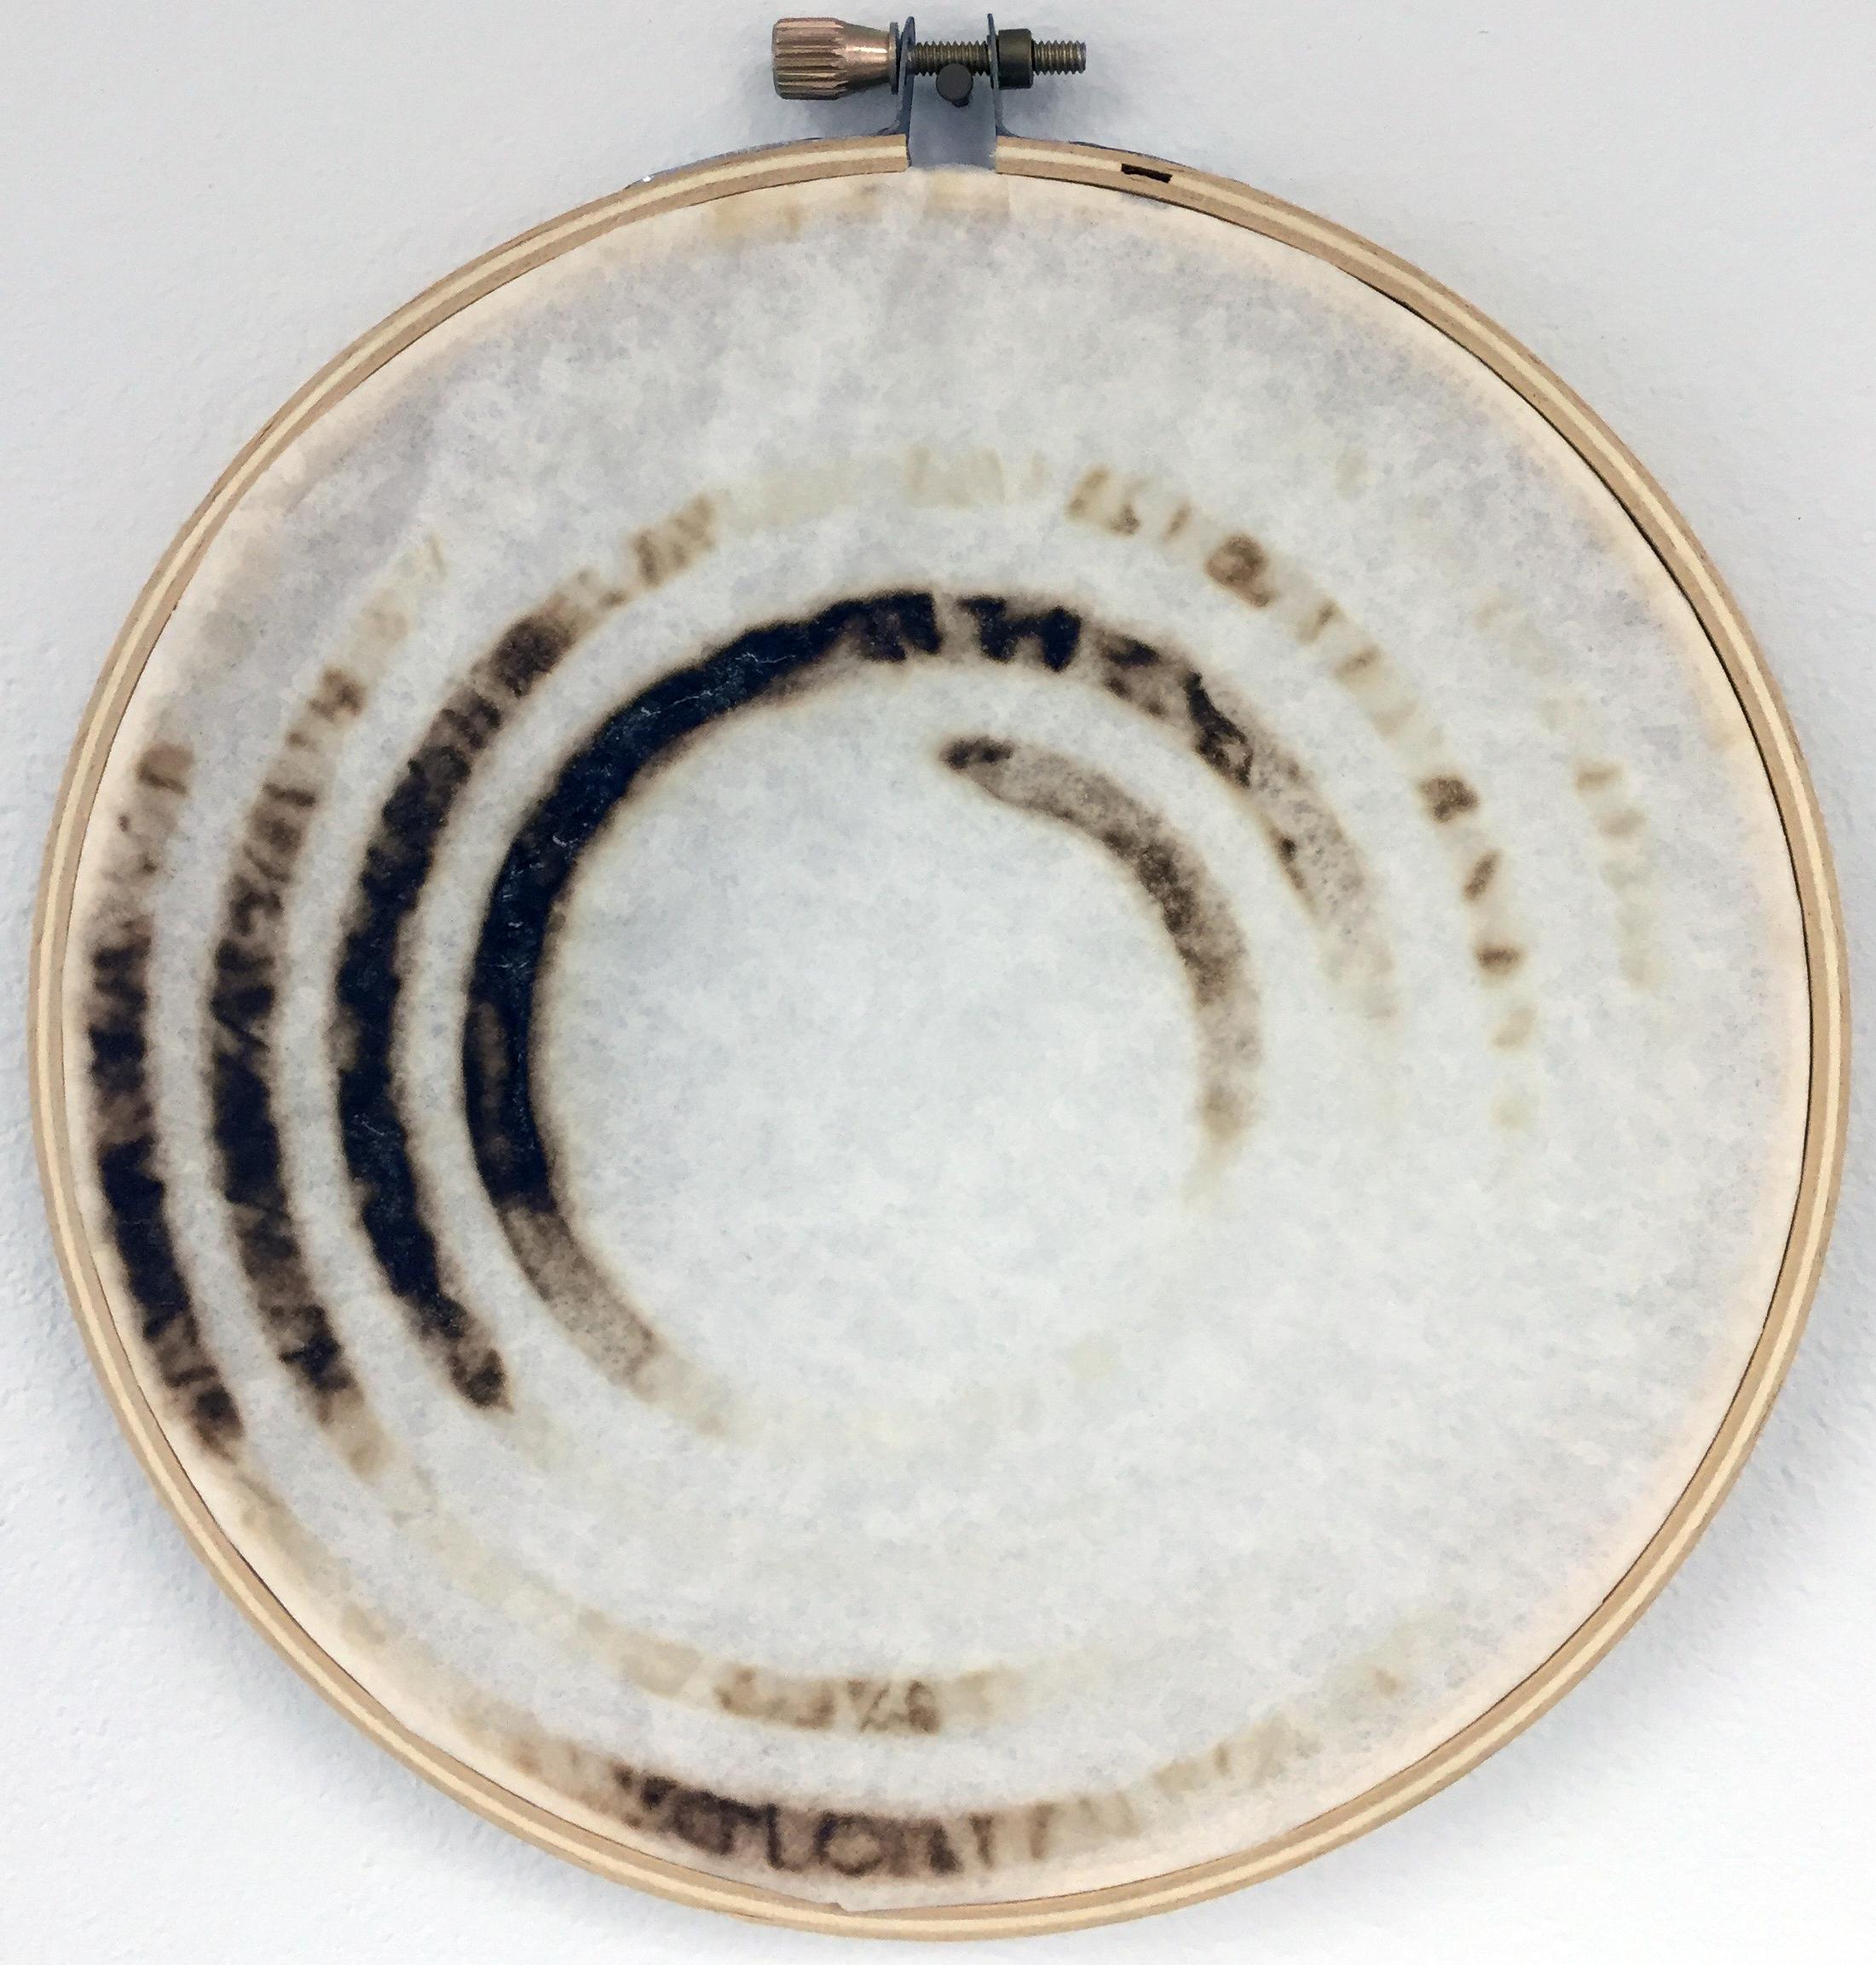 Scorched paper 6in. diameter